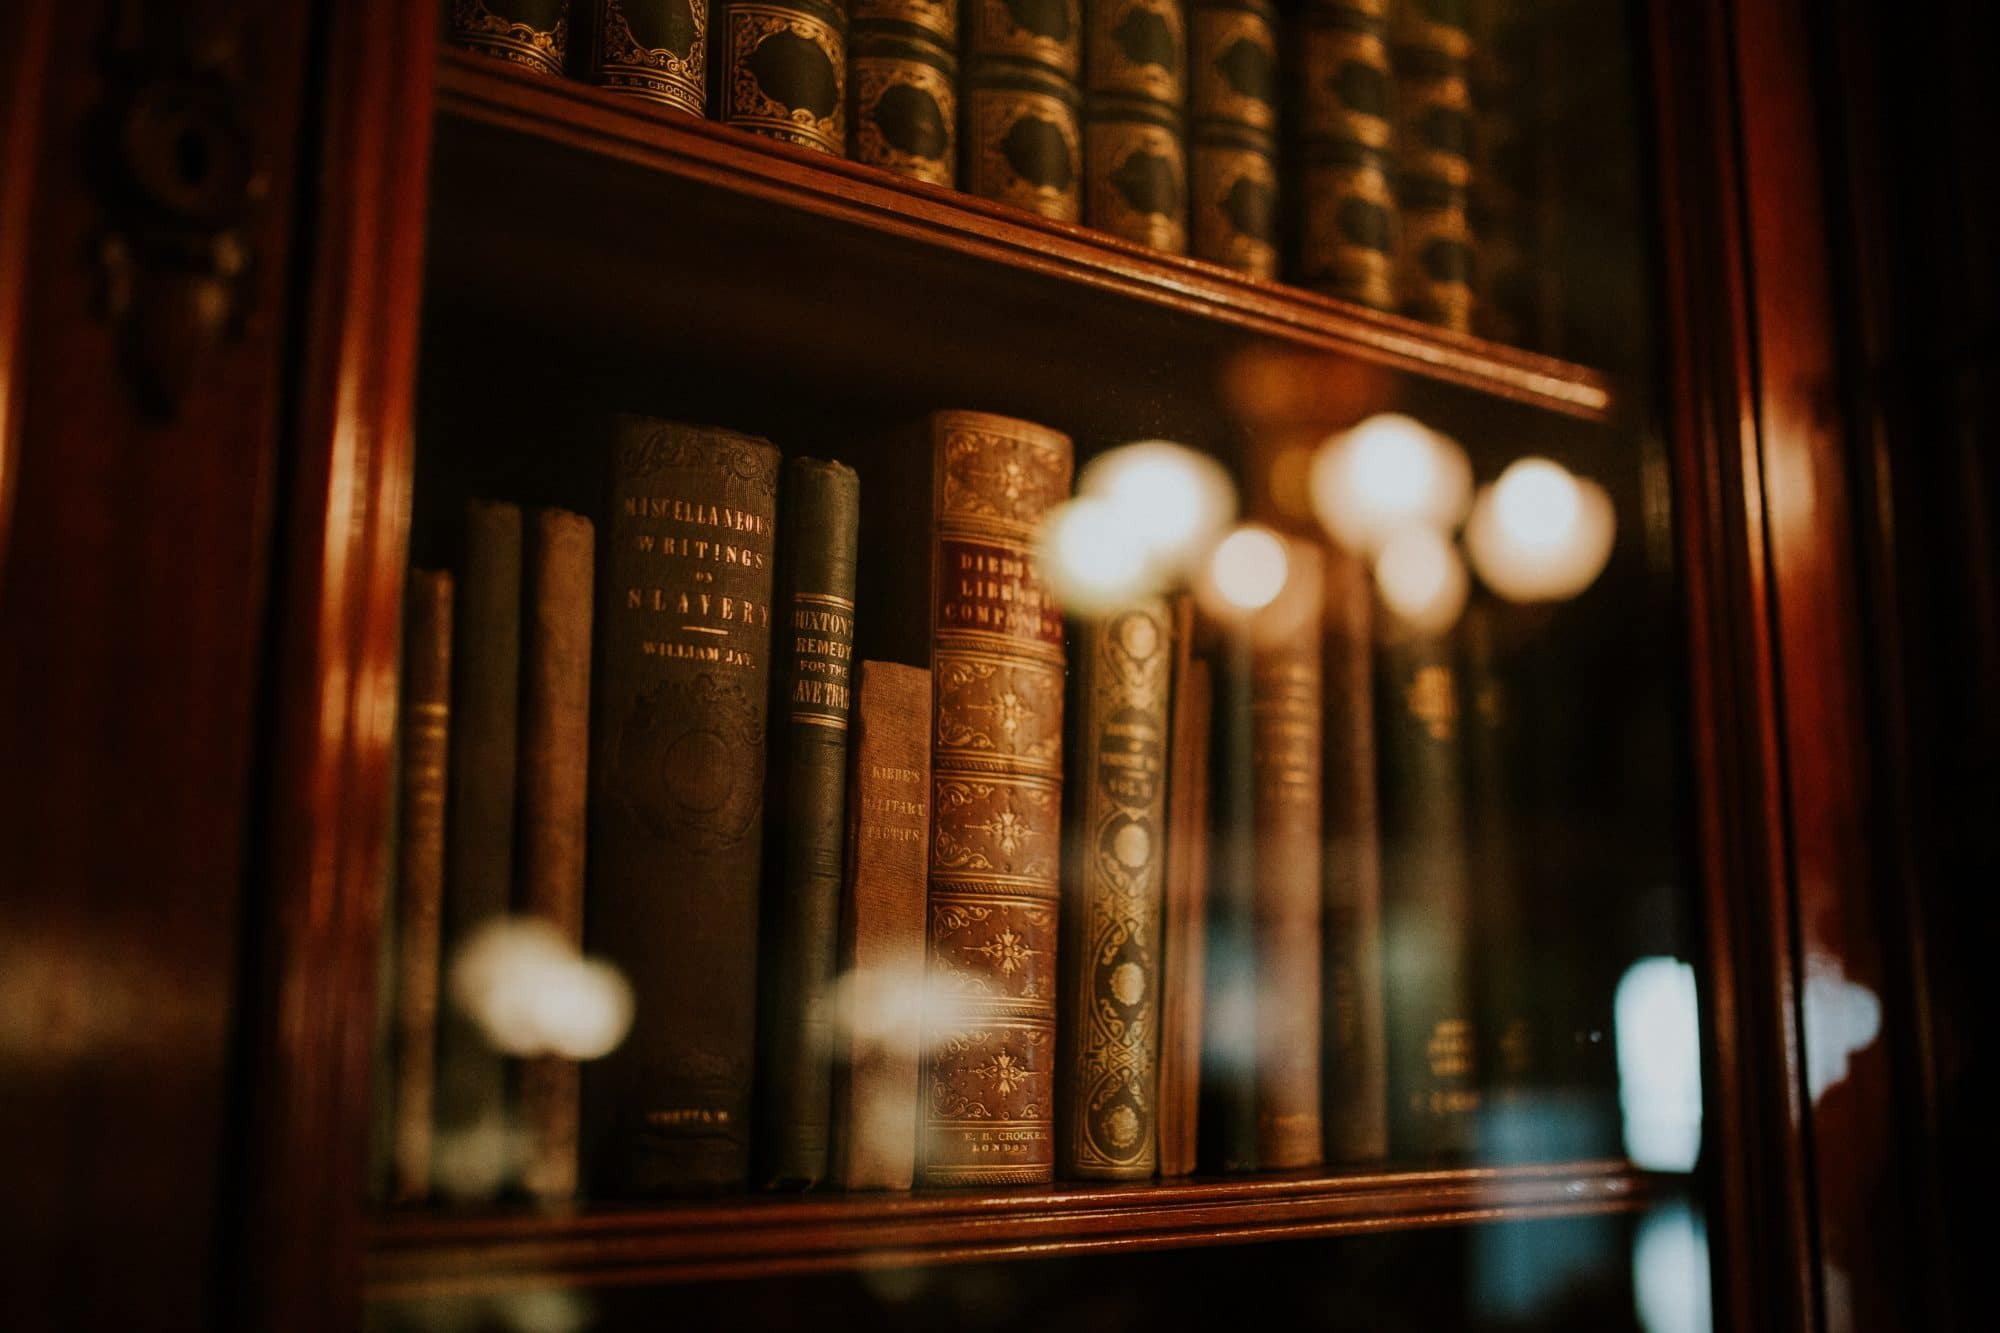 bookshelf with antique books